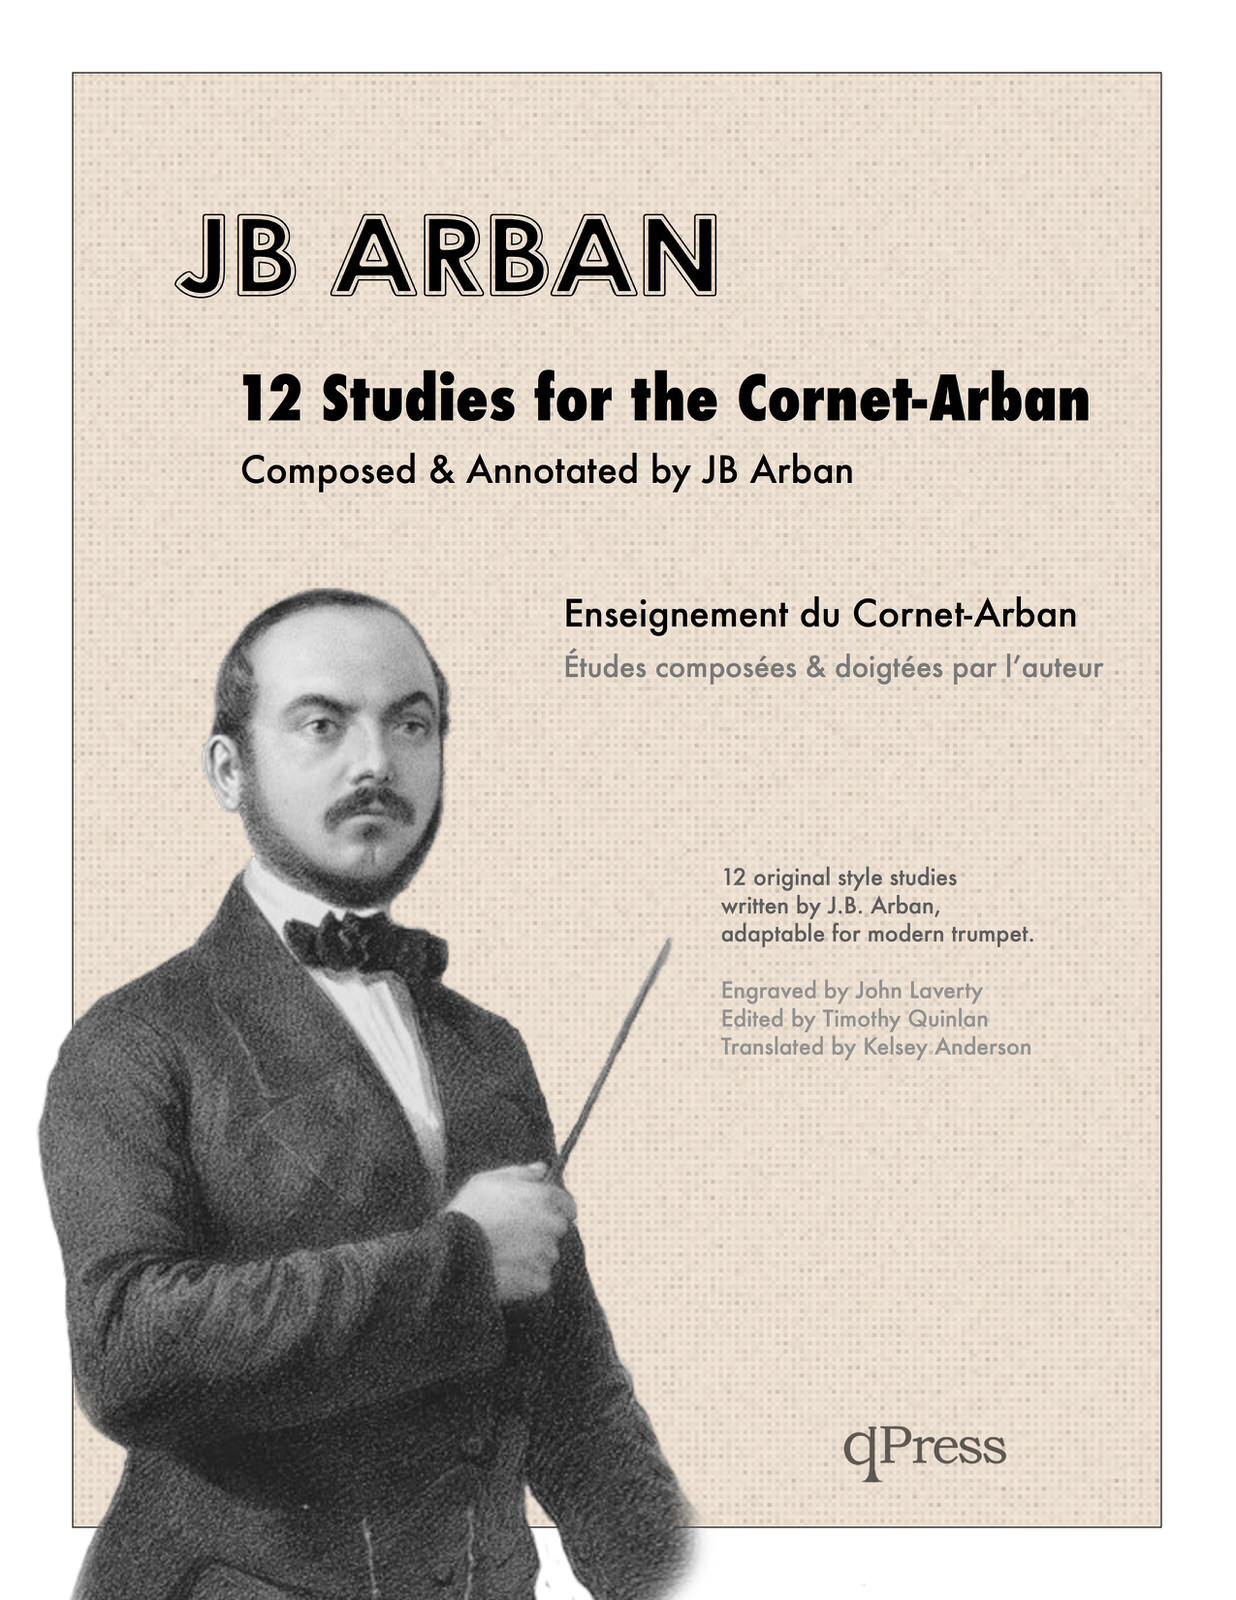 Arban, 12 Studies for the Cornet-Arban-p01